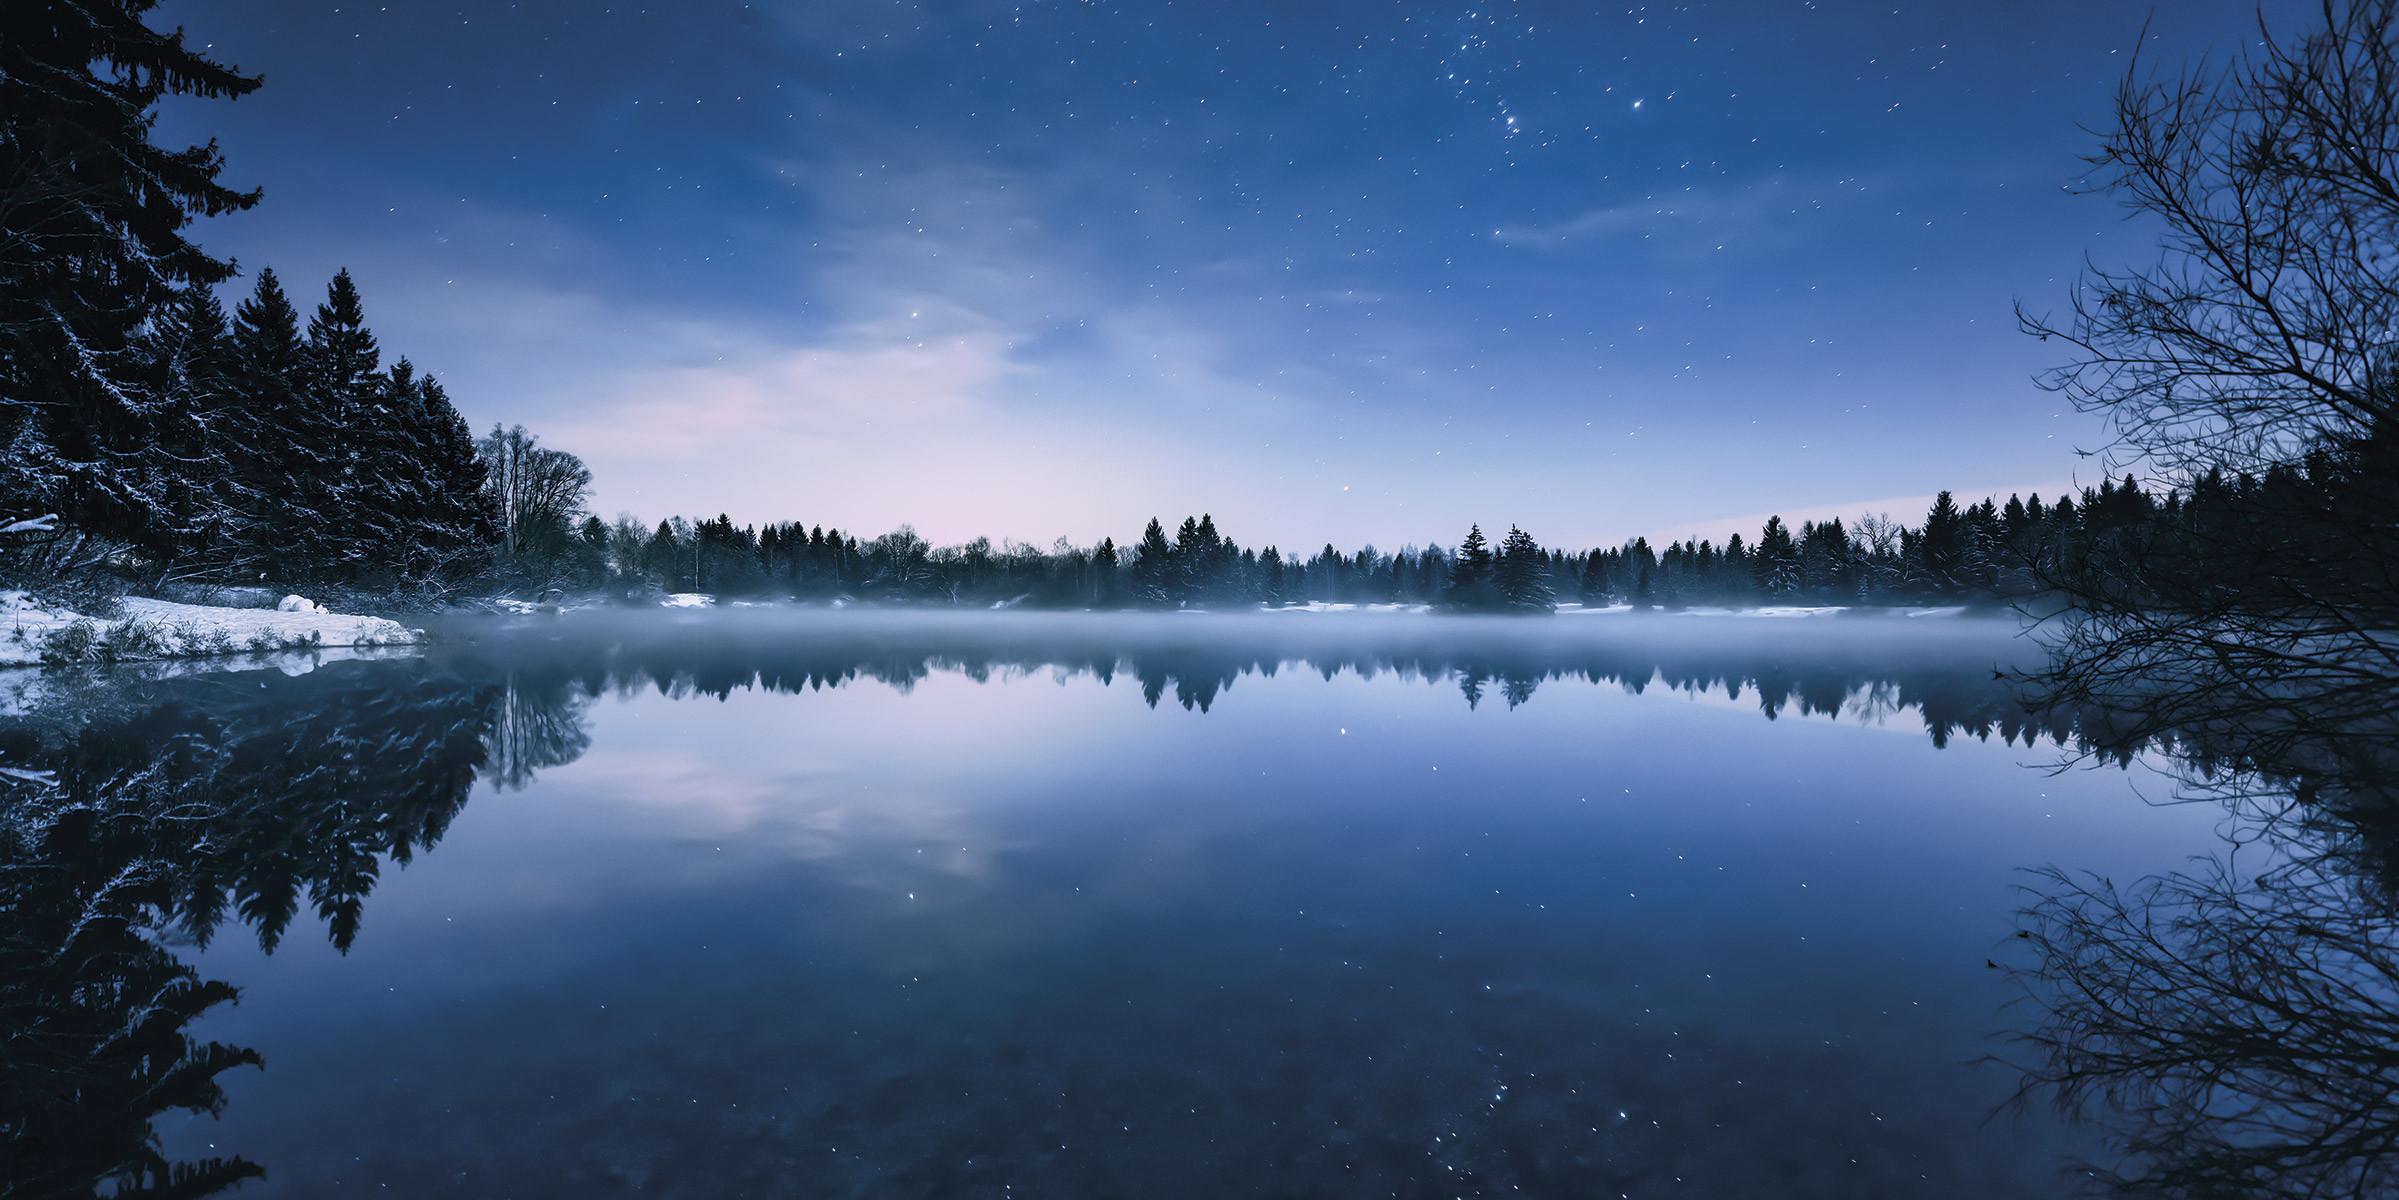 Glistening Stars